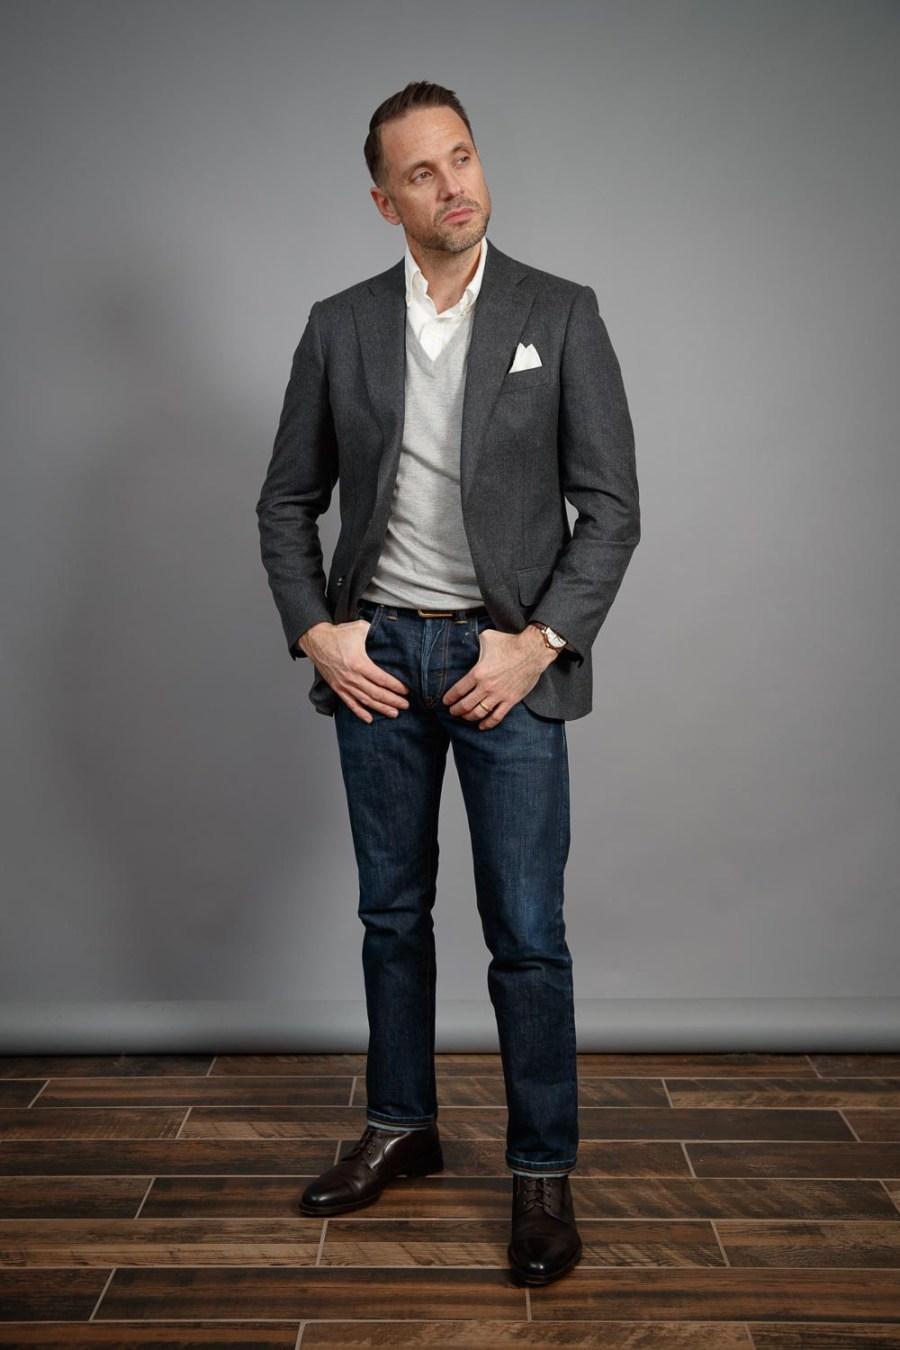 flannel-sportcoat-jeans-raw-denim-boots-v-neck-sweater-for-men